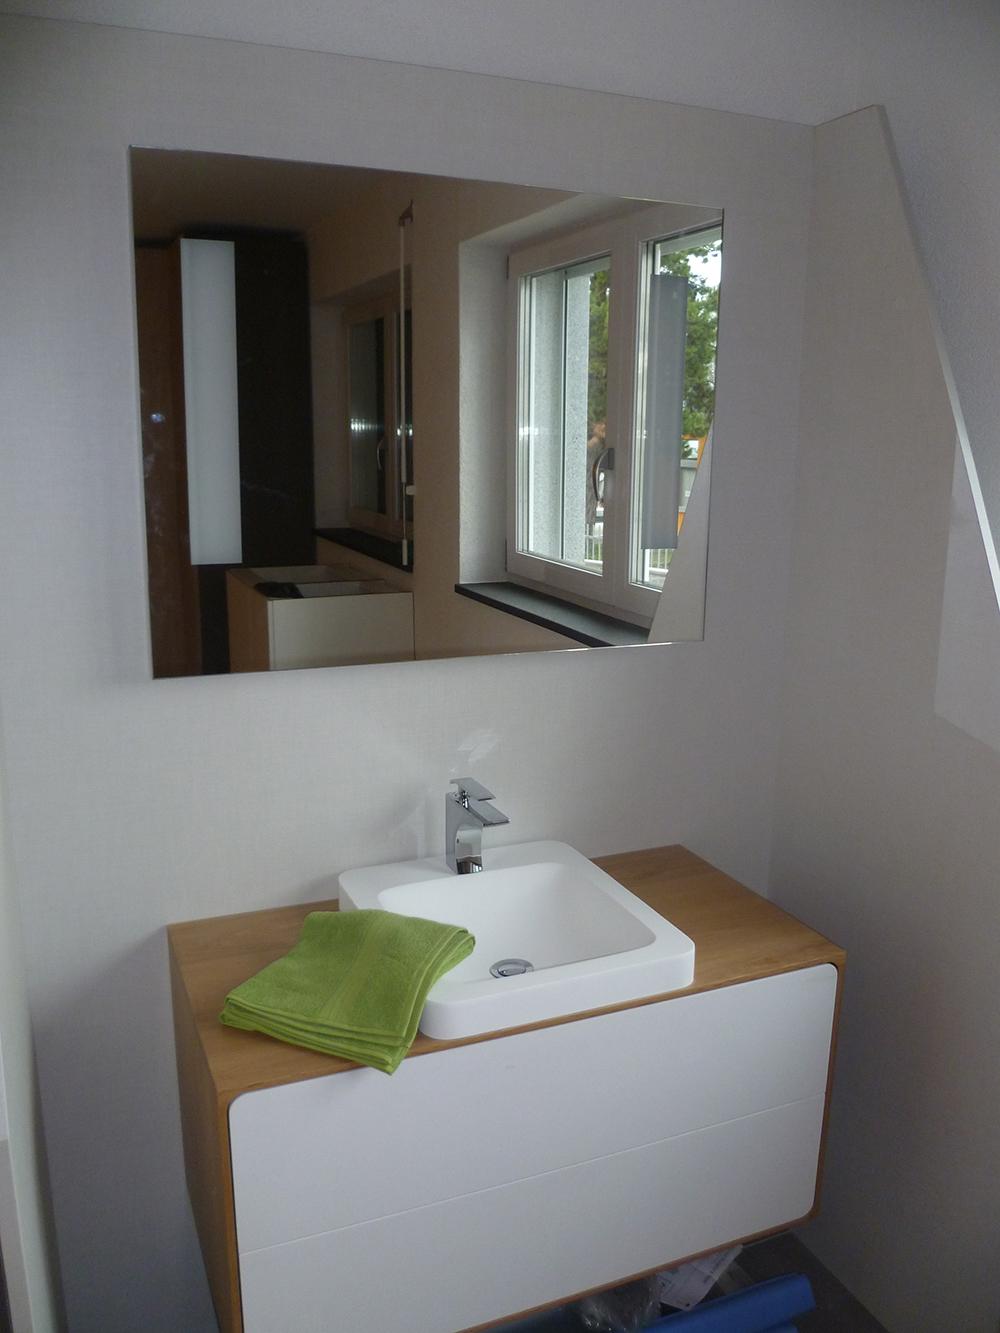 Destockage promo meubles cuisines salle de bains dressing - Destockage salle de bain ...